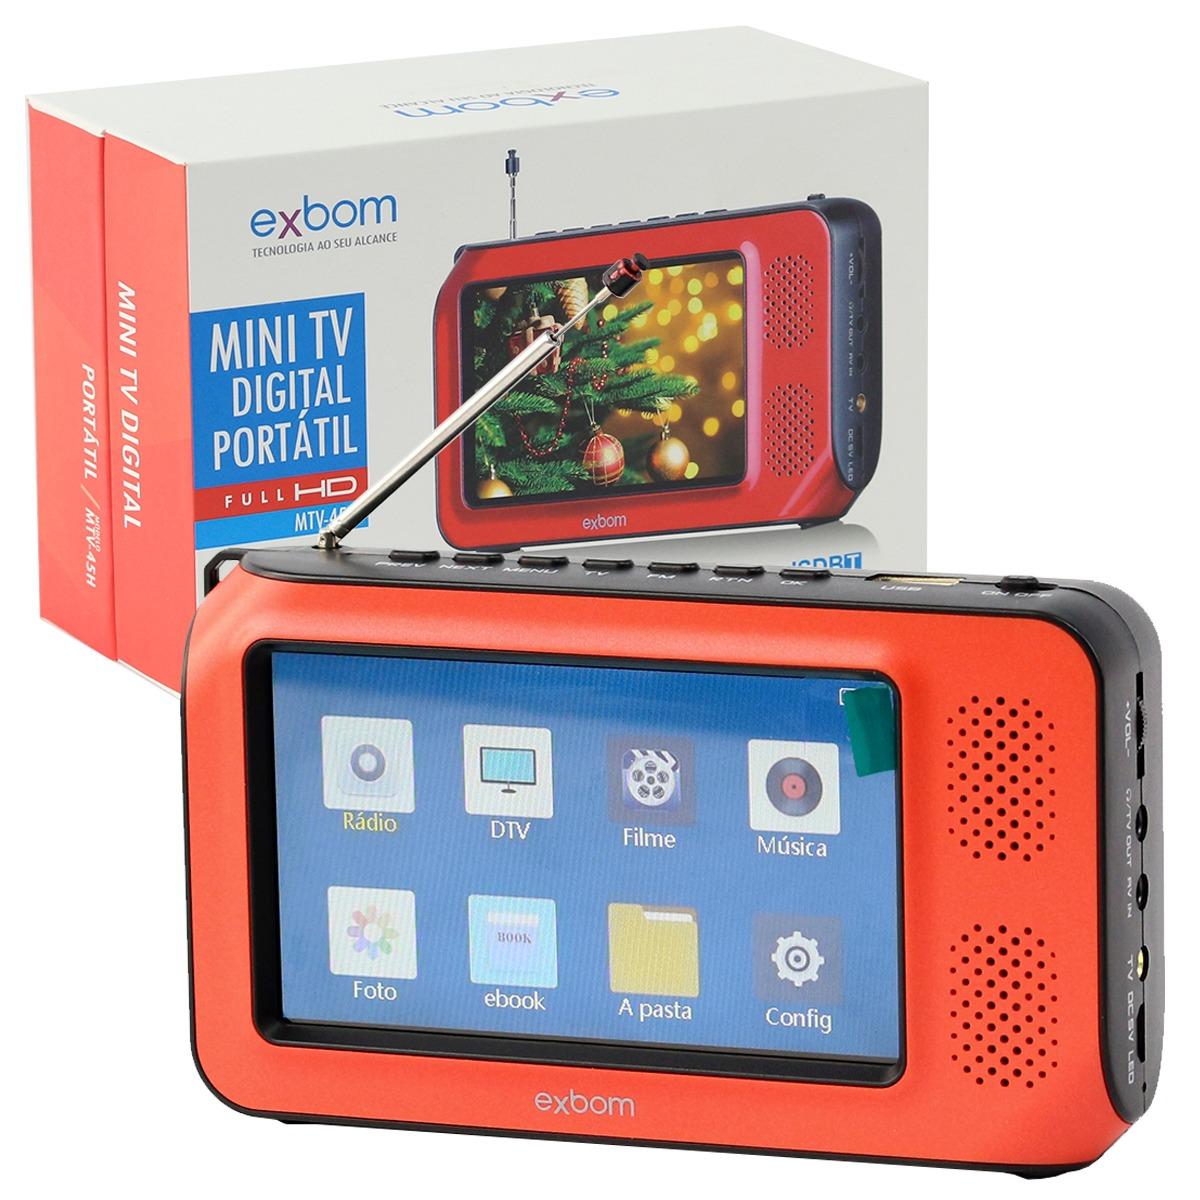 Mini Tv Digital Portatil Videos Fotos Filmes Radio Fm Tf ...